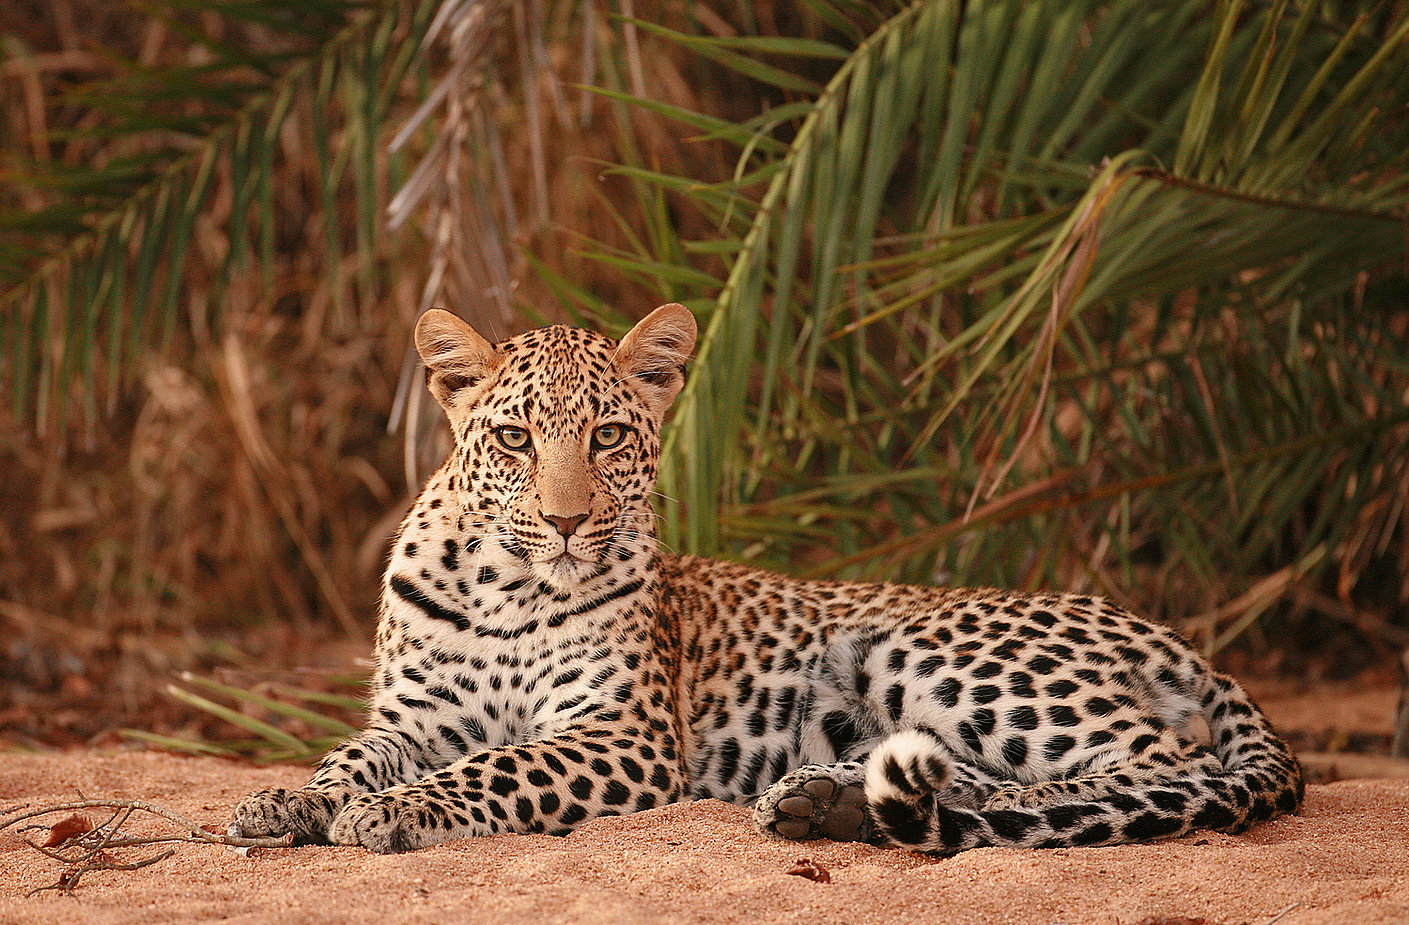 Leopard, Sabi Sands safari, South Africa